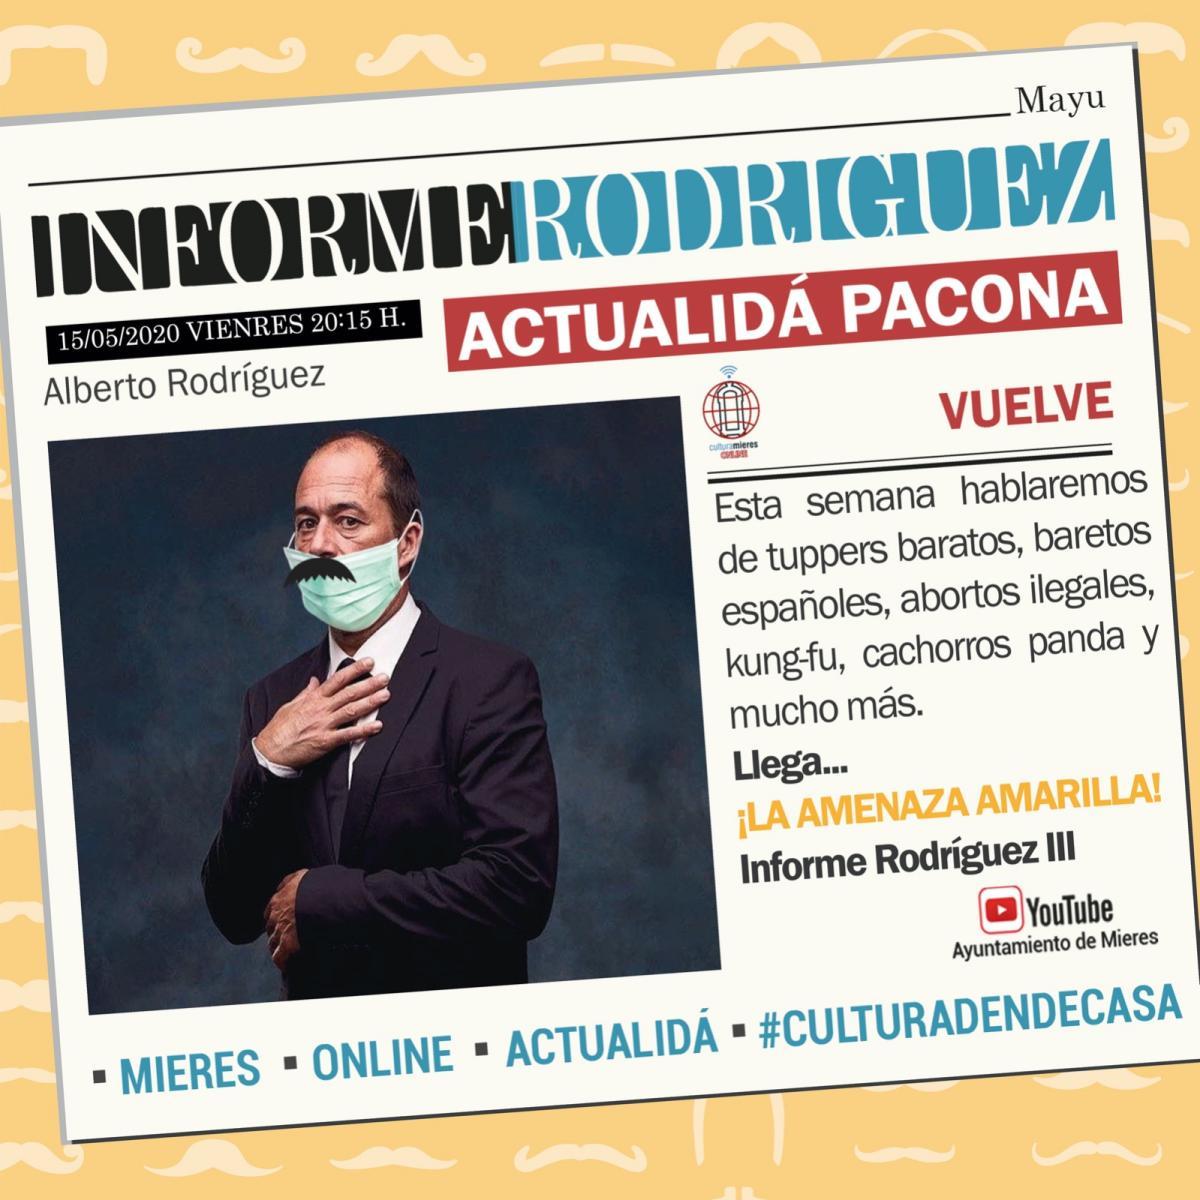 Informe Rodriguez 15052020 Web